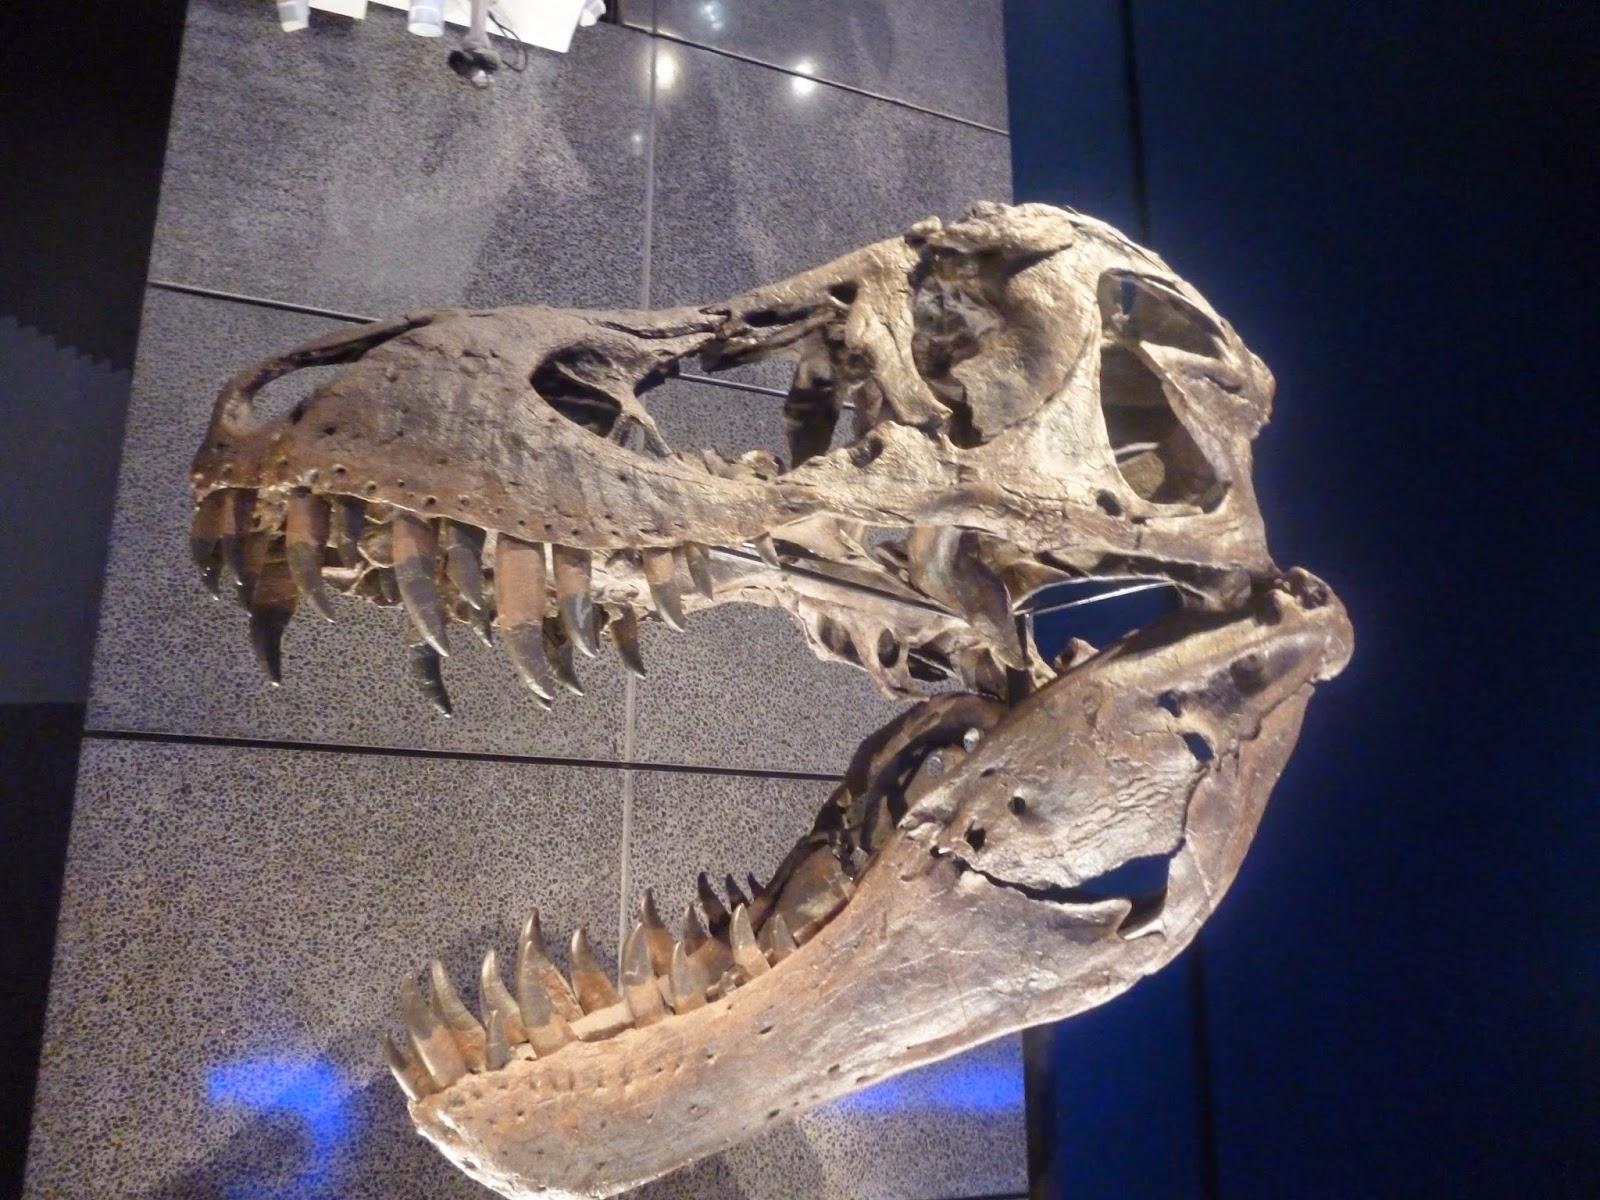 Carbon 14 in Dinosaur bones - Scientific Evidence - The BioLogos Forum